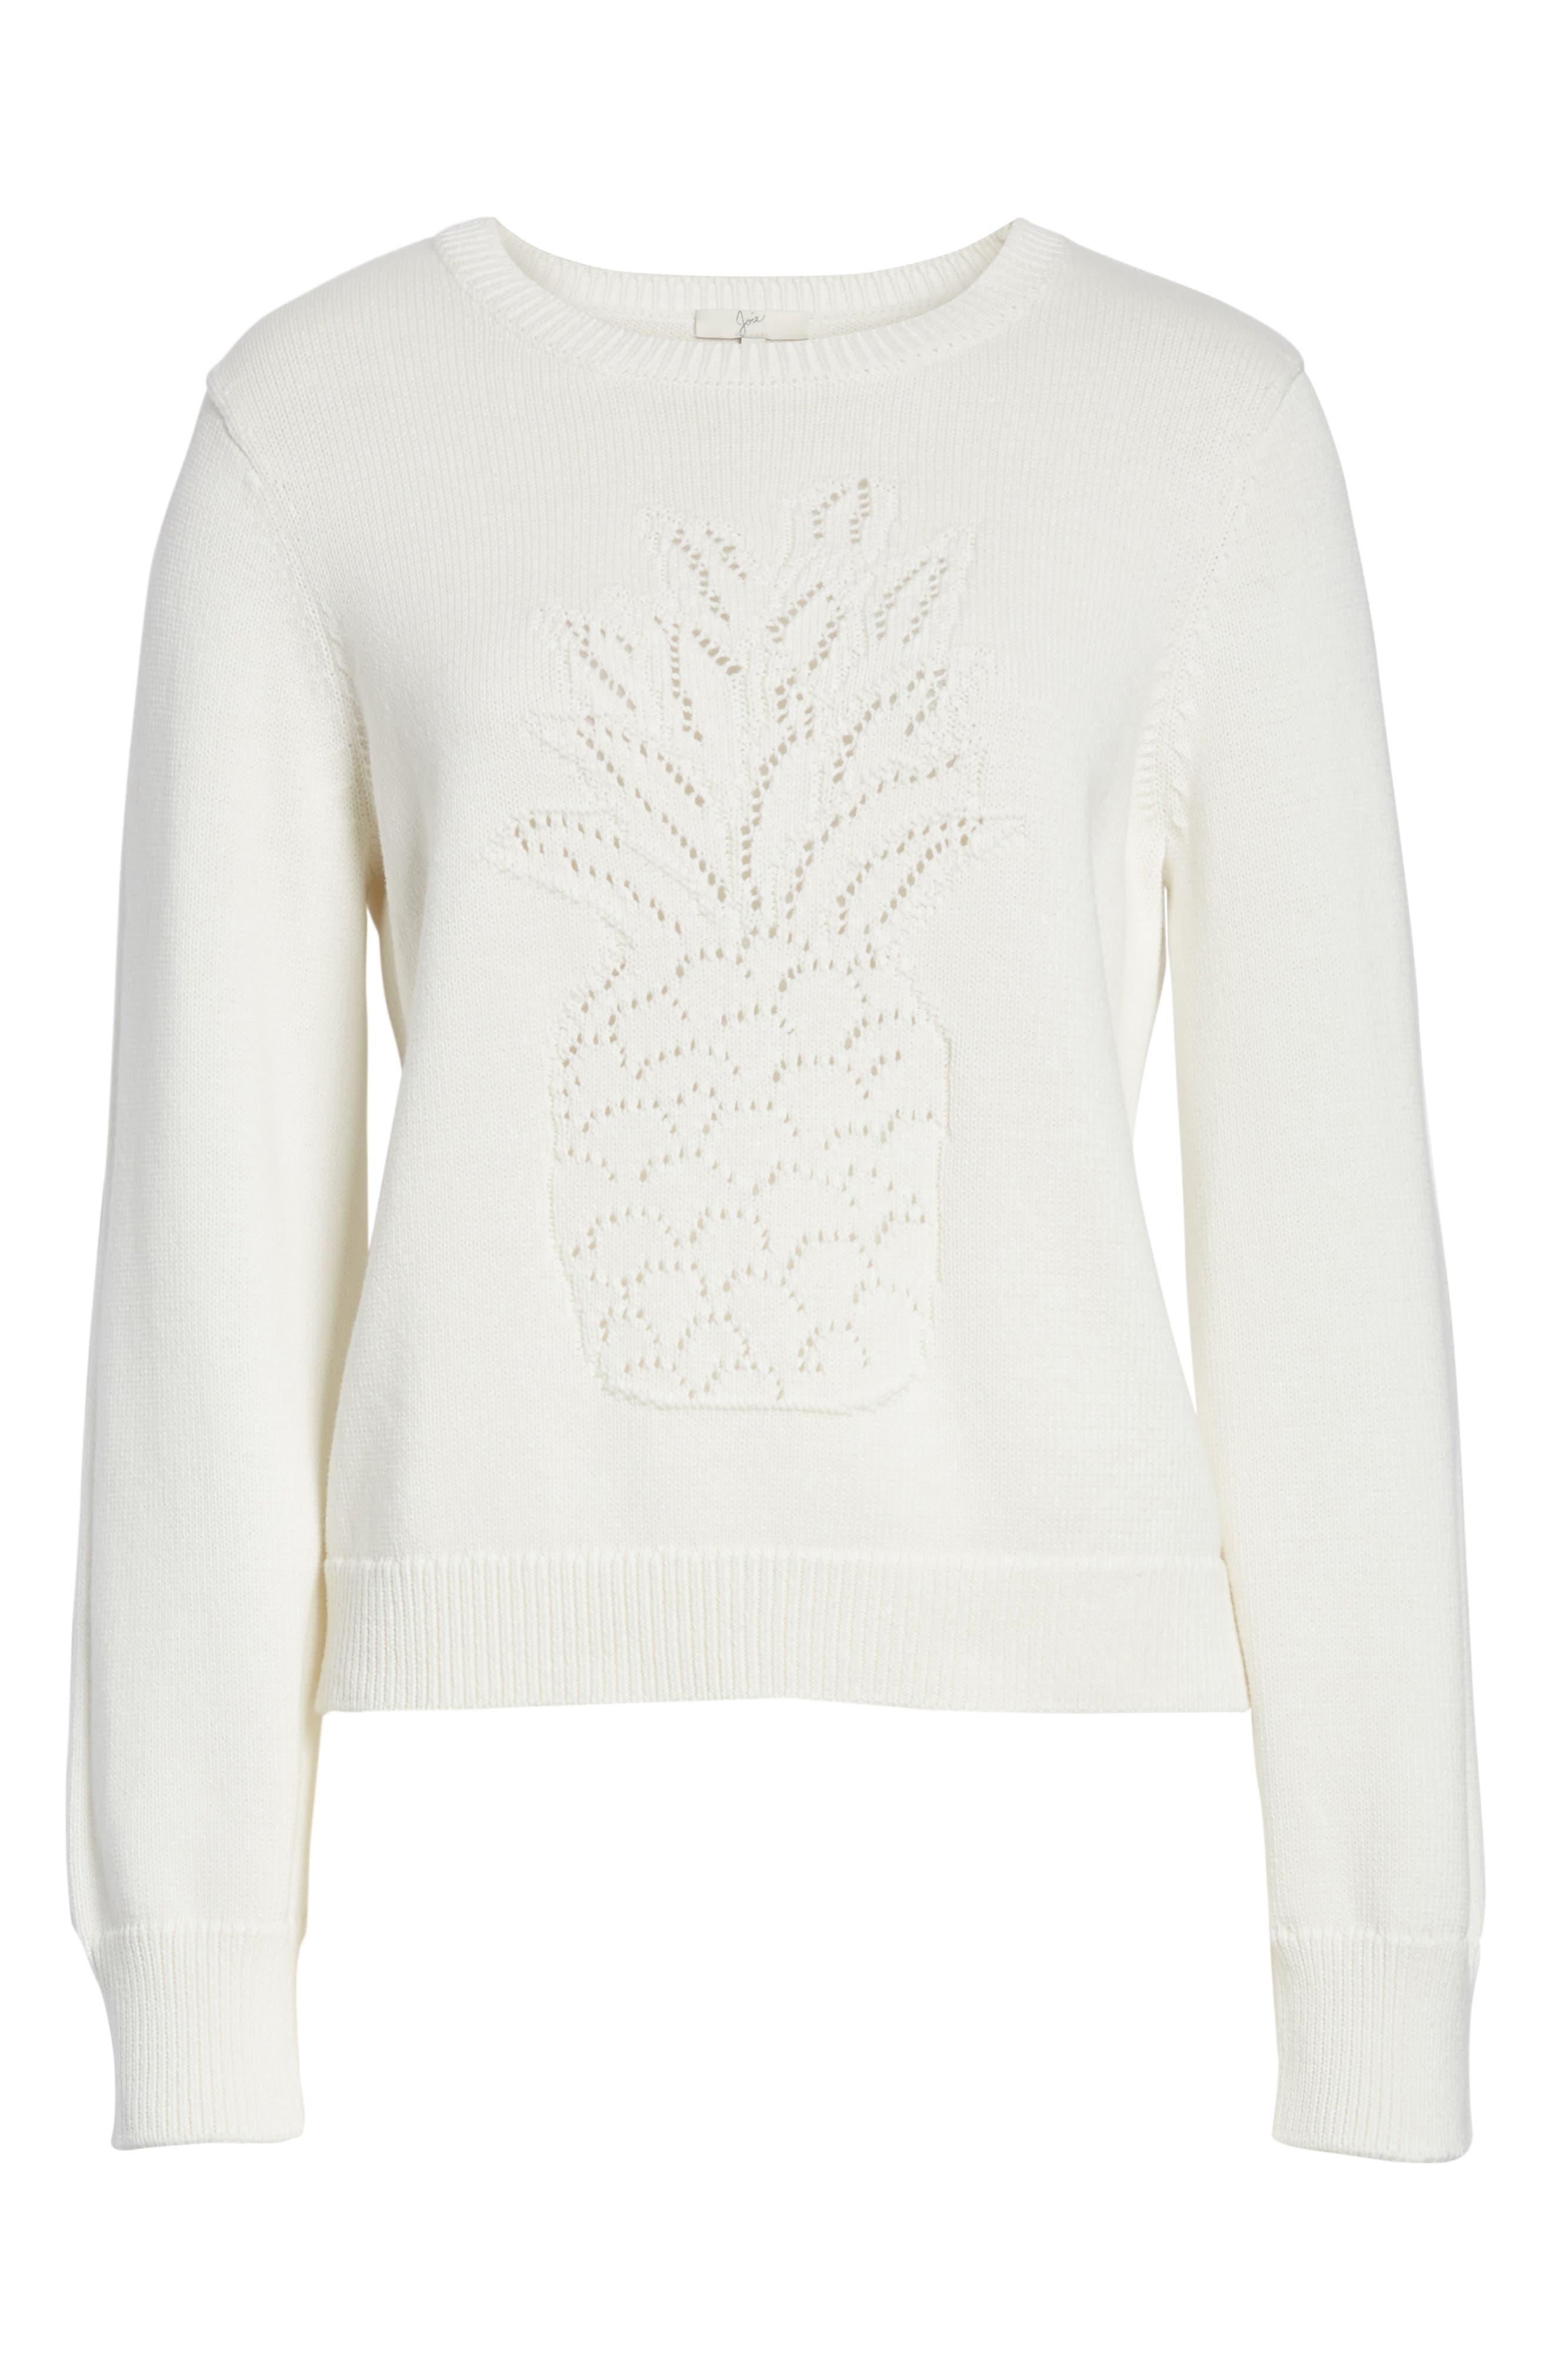 Barin Pineapple Cotton Sweater,                             Alternate thumbnail 6, color,                             Porcelain